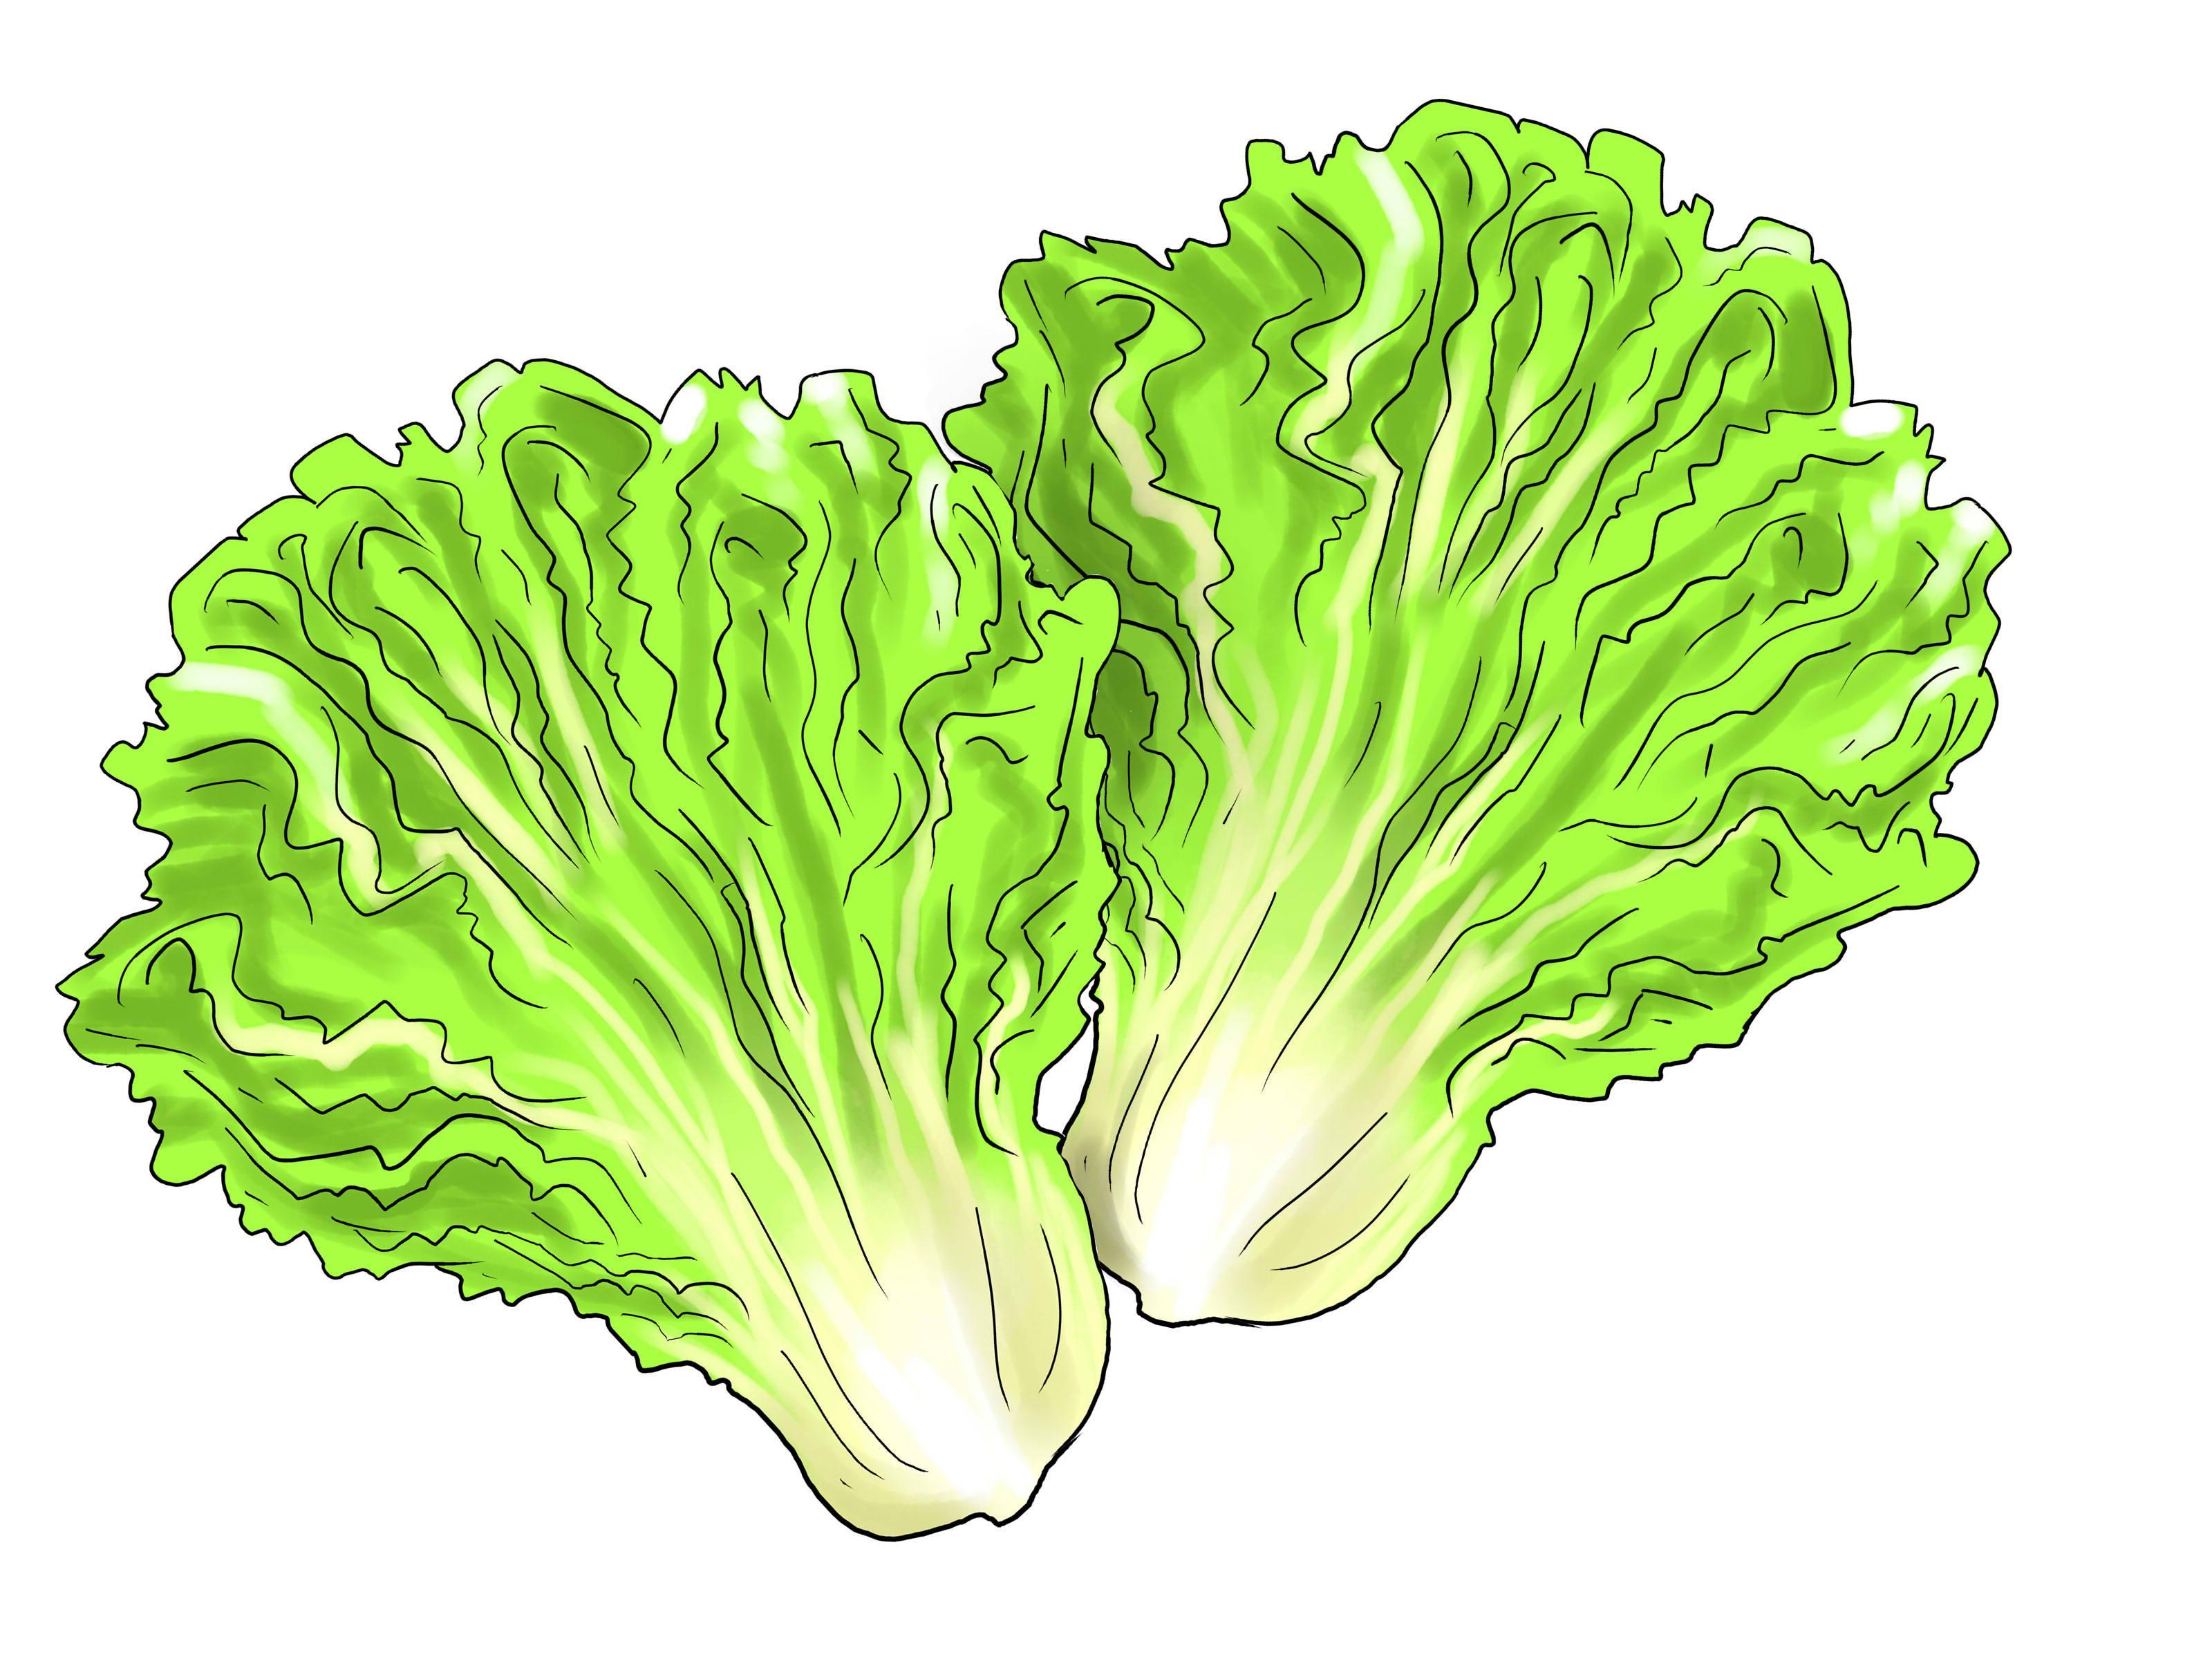 Hd lettuce leaf clipart cdr.